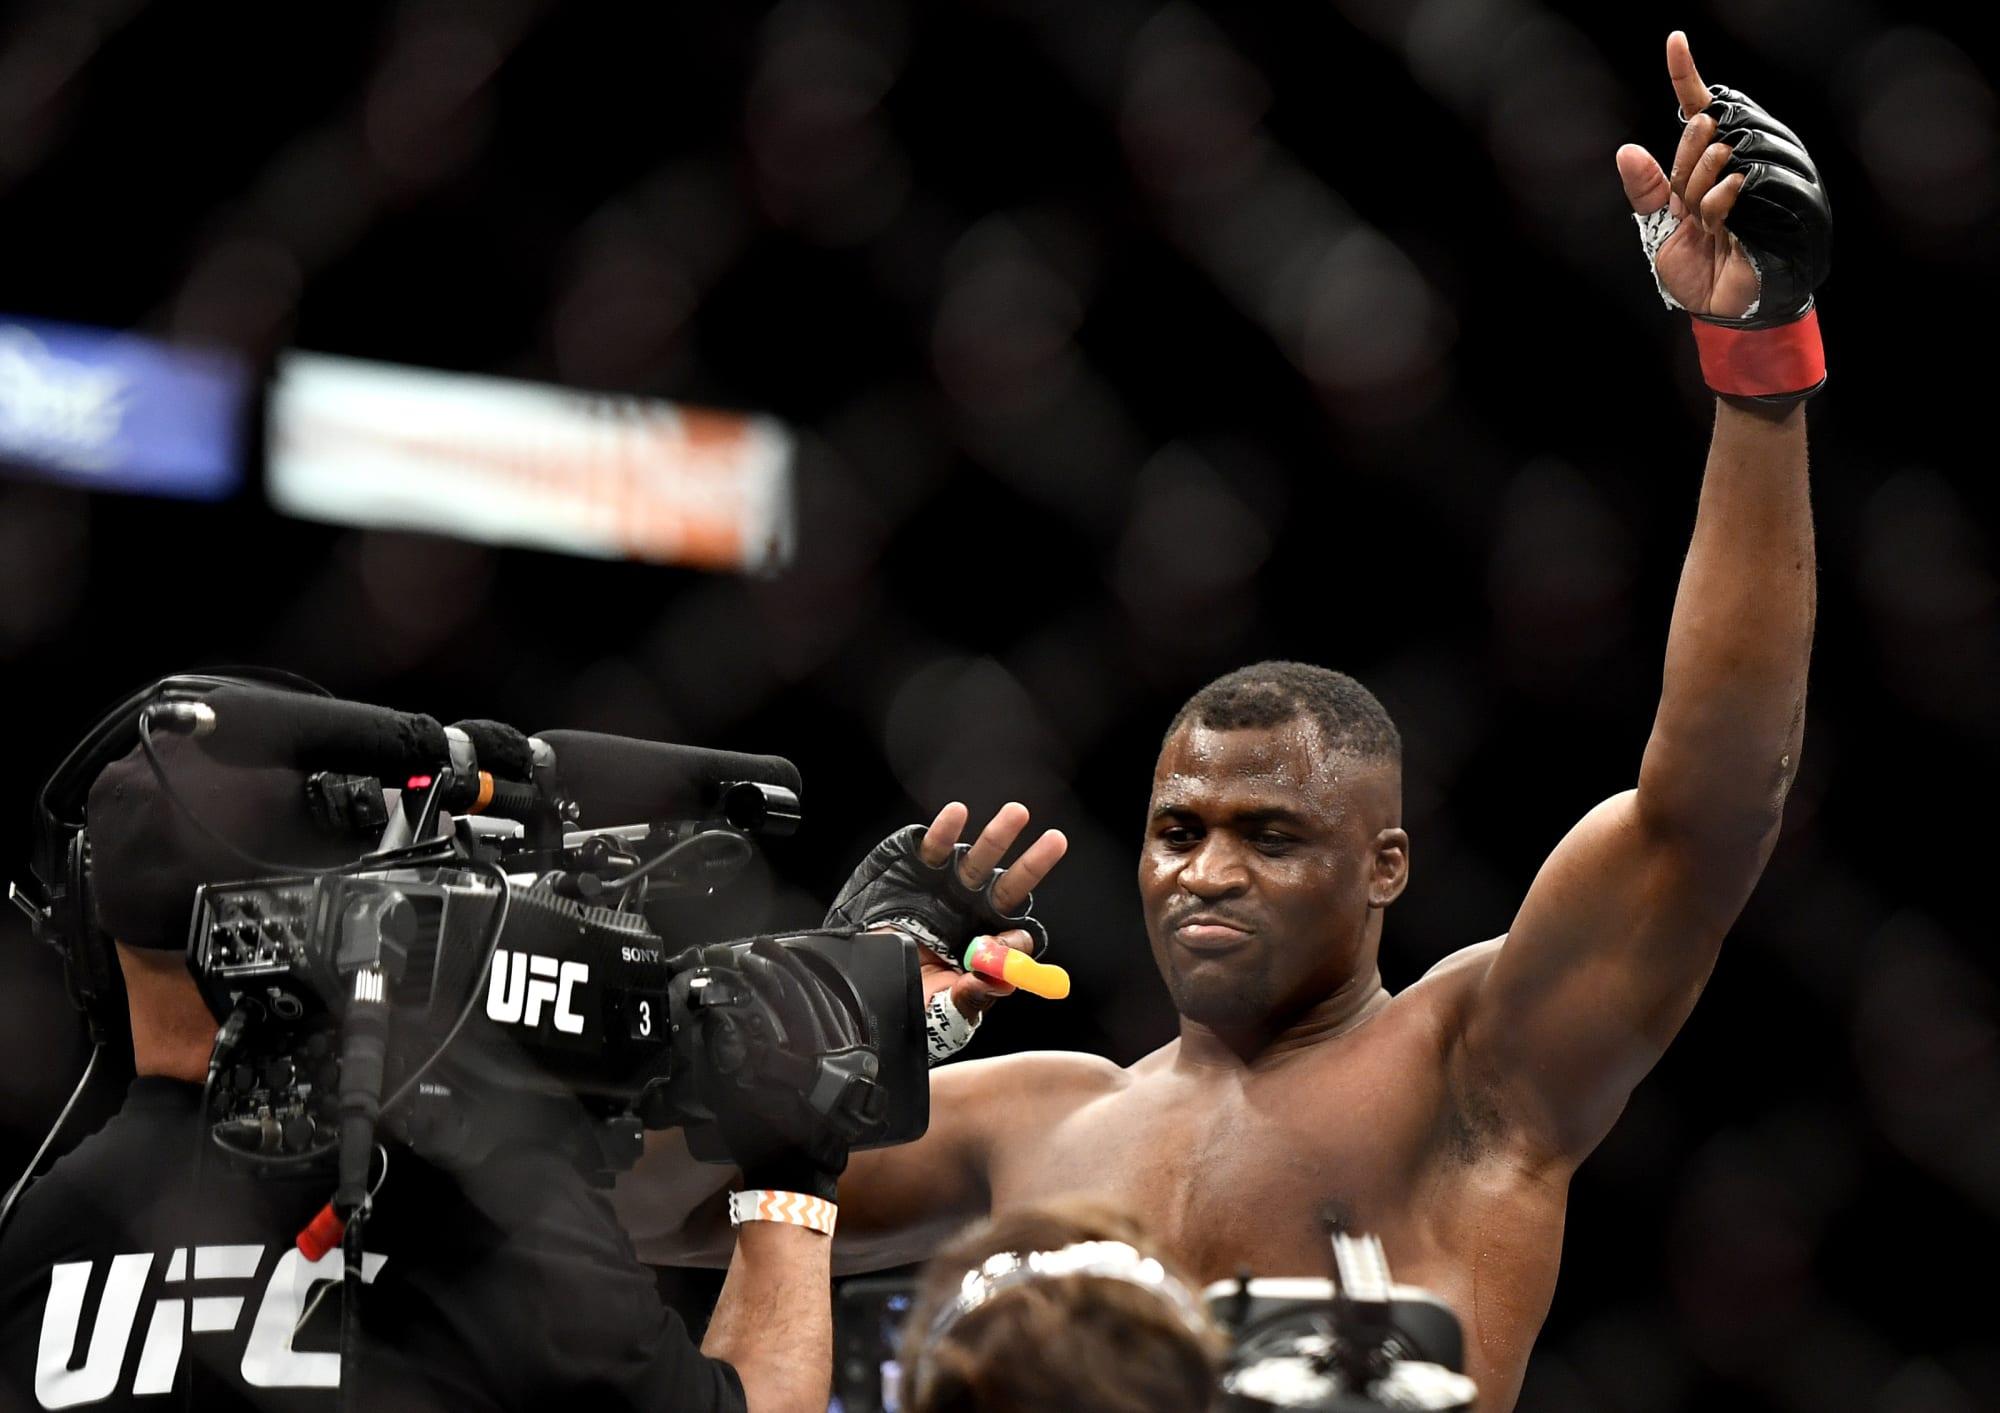 UFC 249: Francis Ngannou flatlines Jairzinho Rozenstruik in 20 seconds